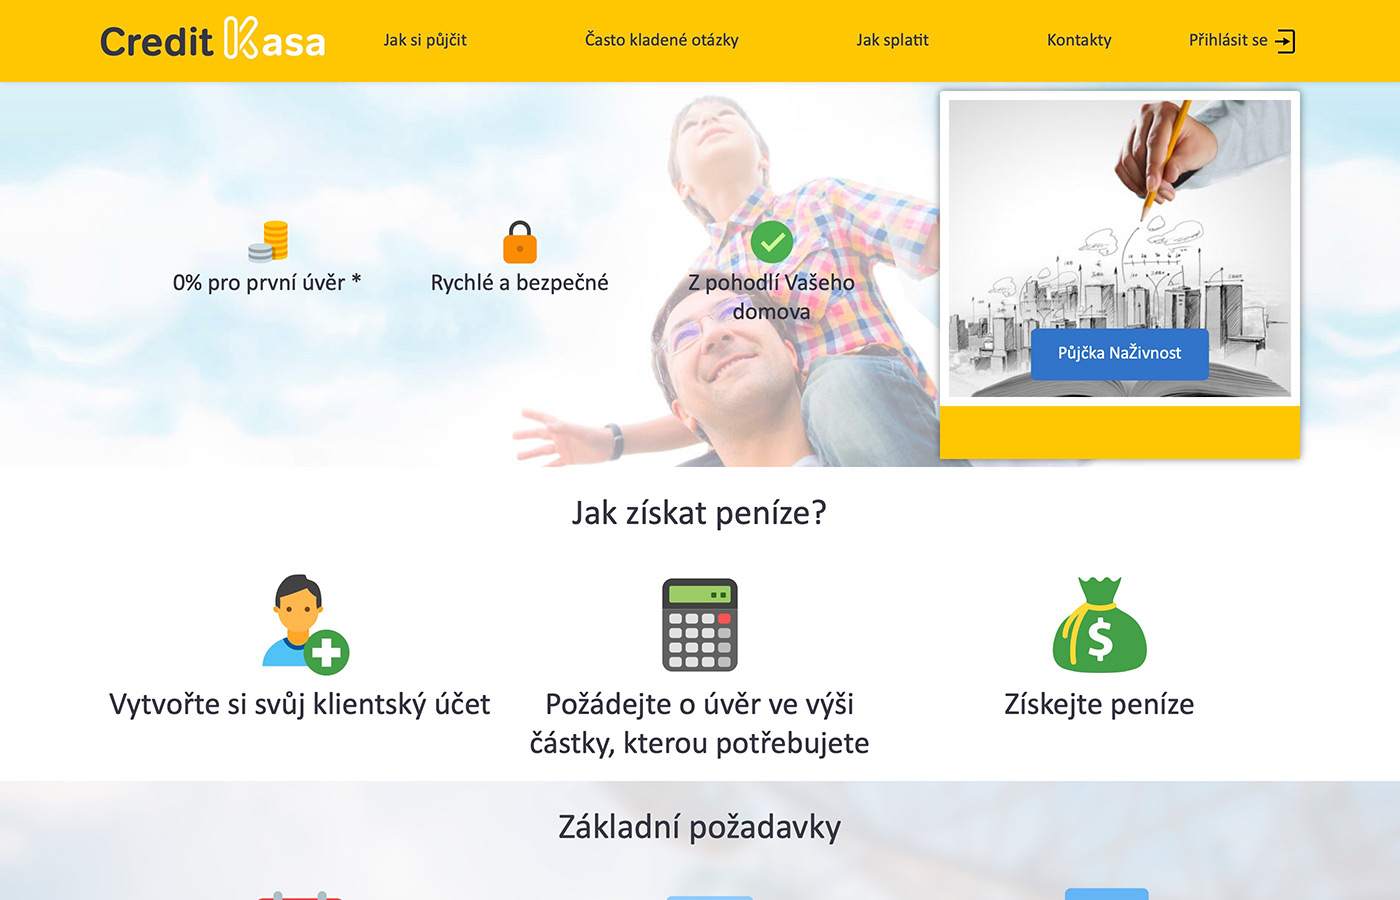 Náhled webu https://www.creditkasa.com